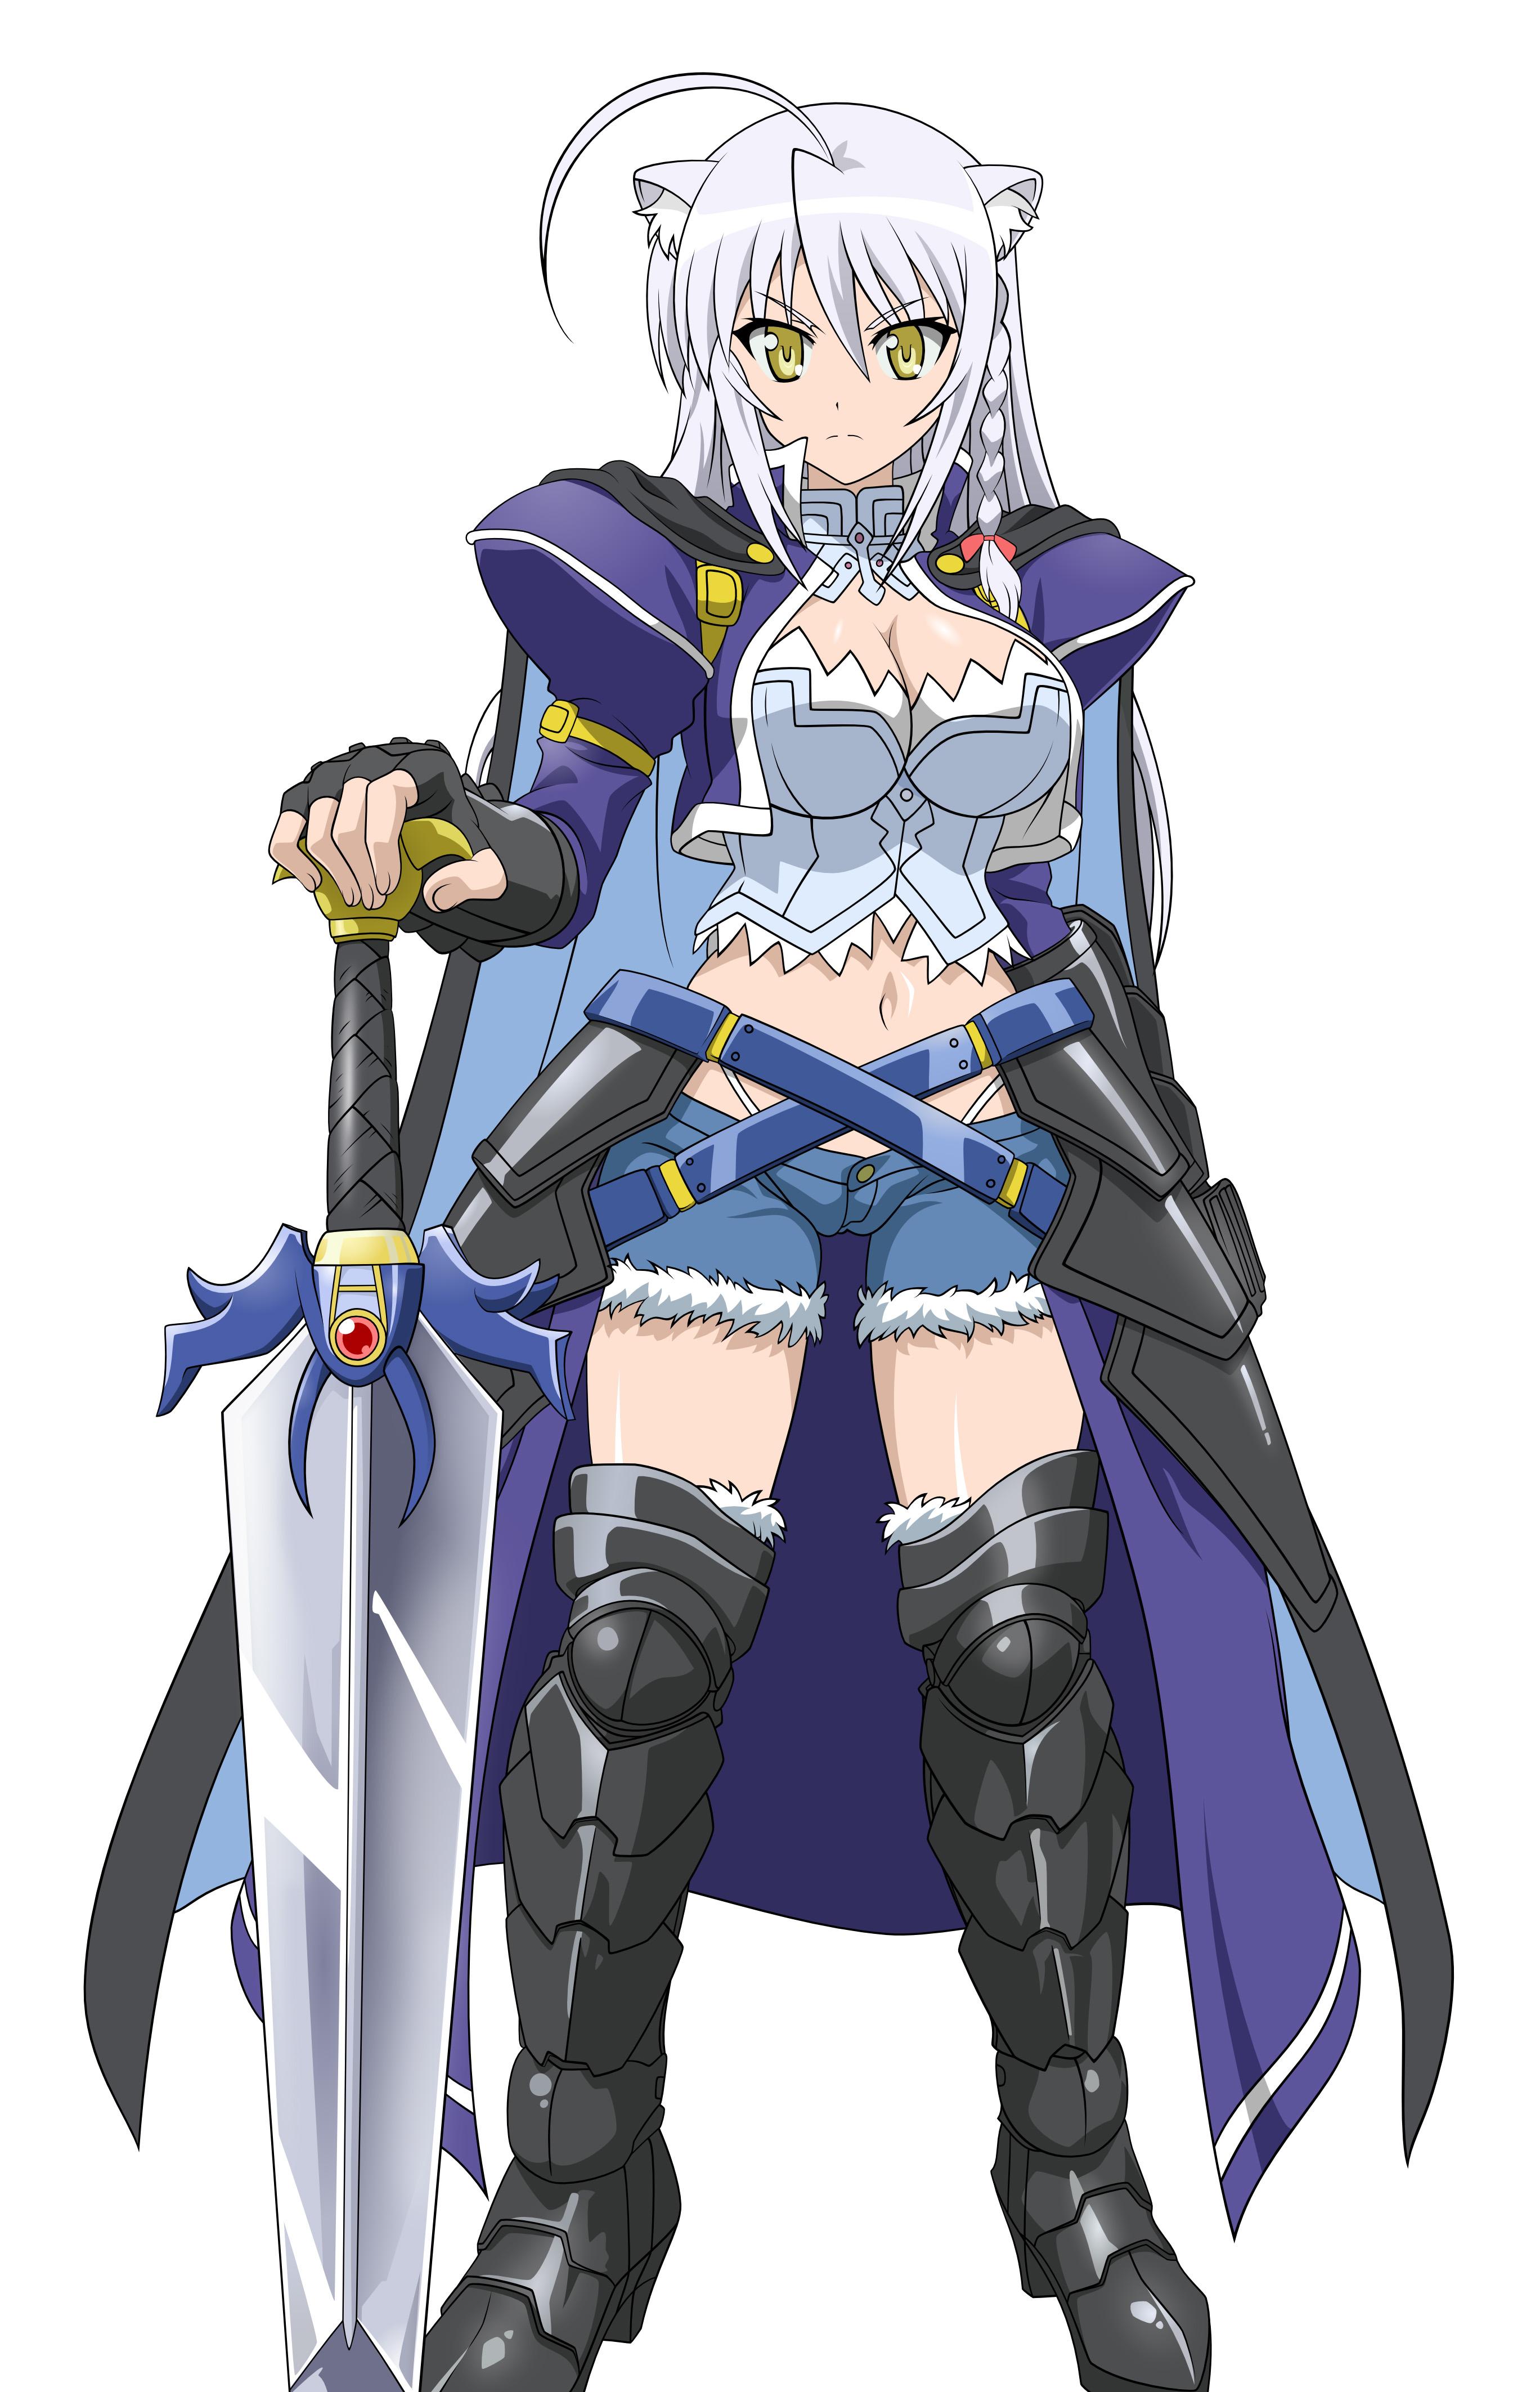 Characters: Demon Hunters 27960e6e439fa09699c14cd9c76c3175_by_kikoaihara-dbu5p3a